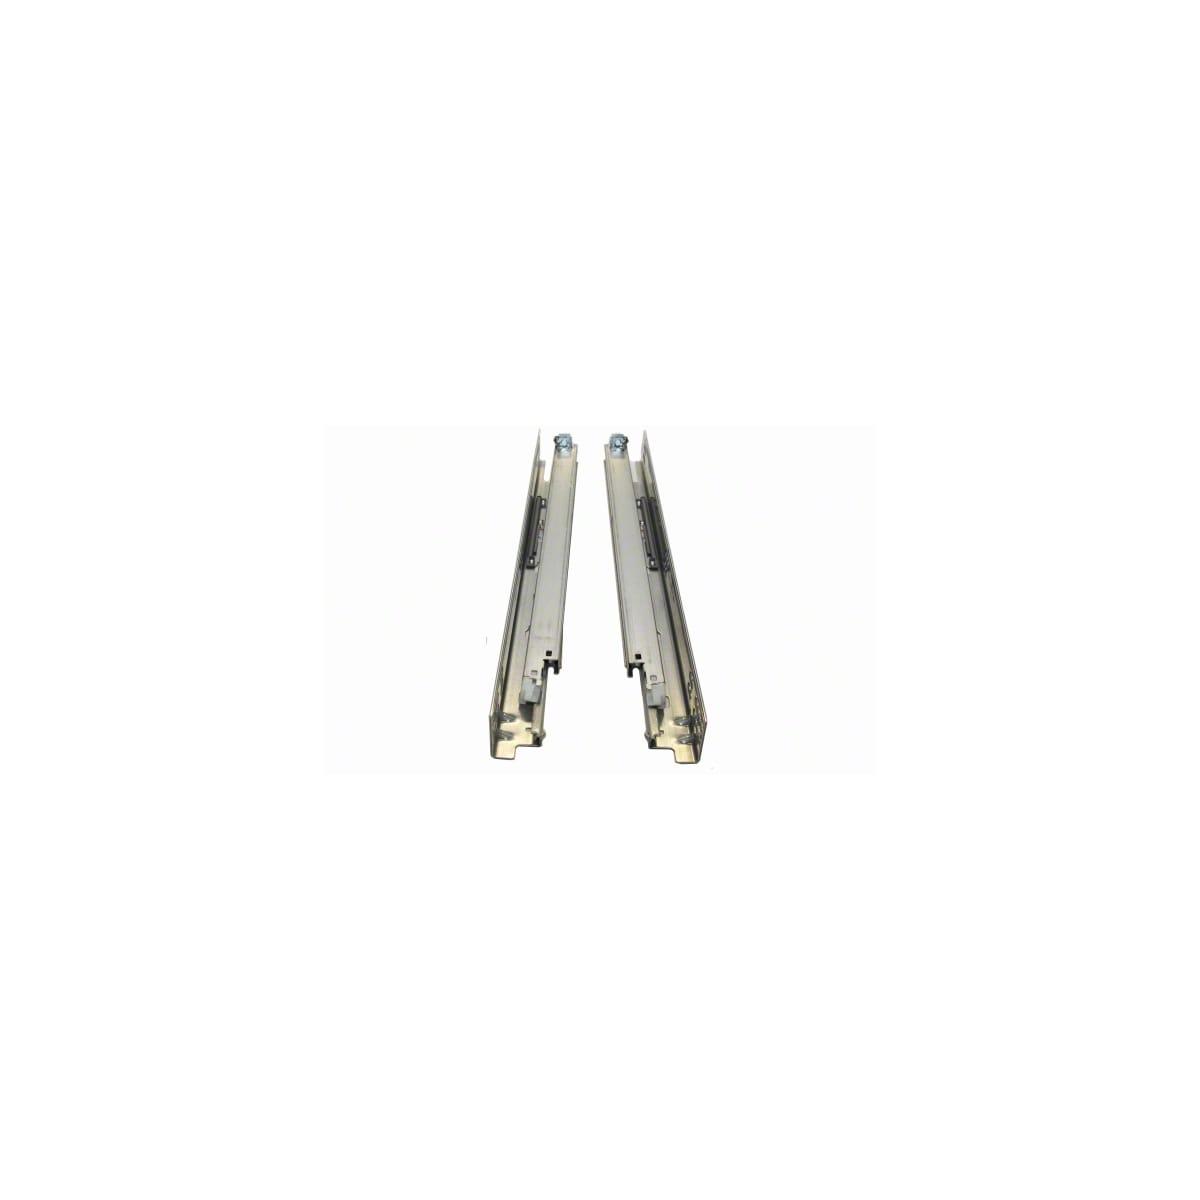 Blum 562h5330b Zinc Plated Tandem Plus Blumotion Full Extension